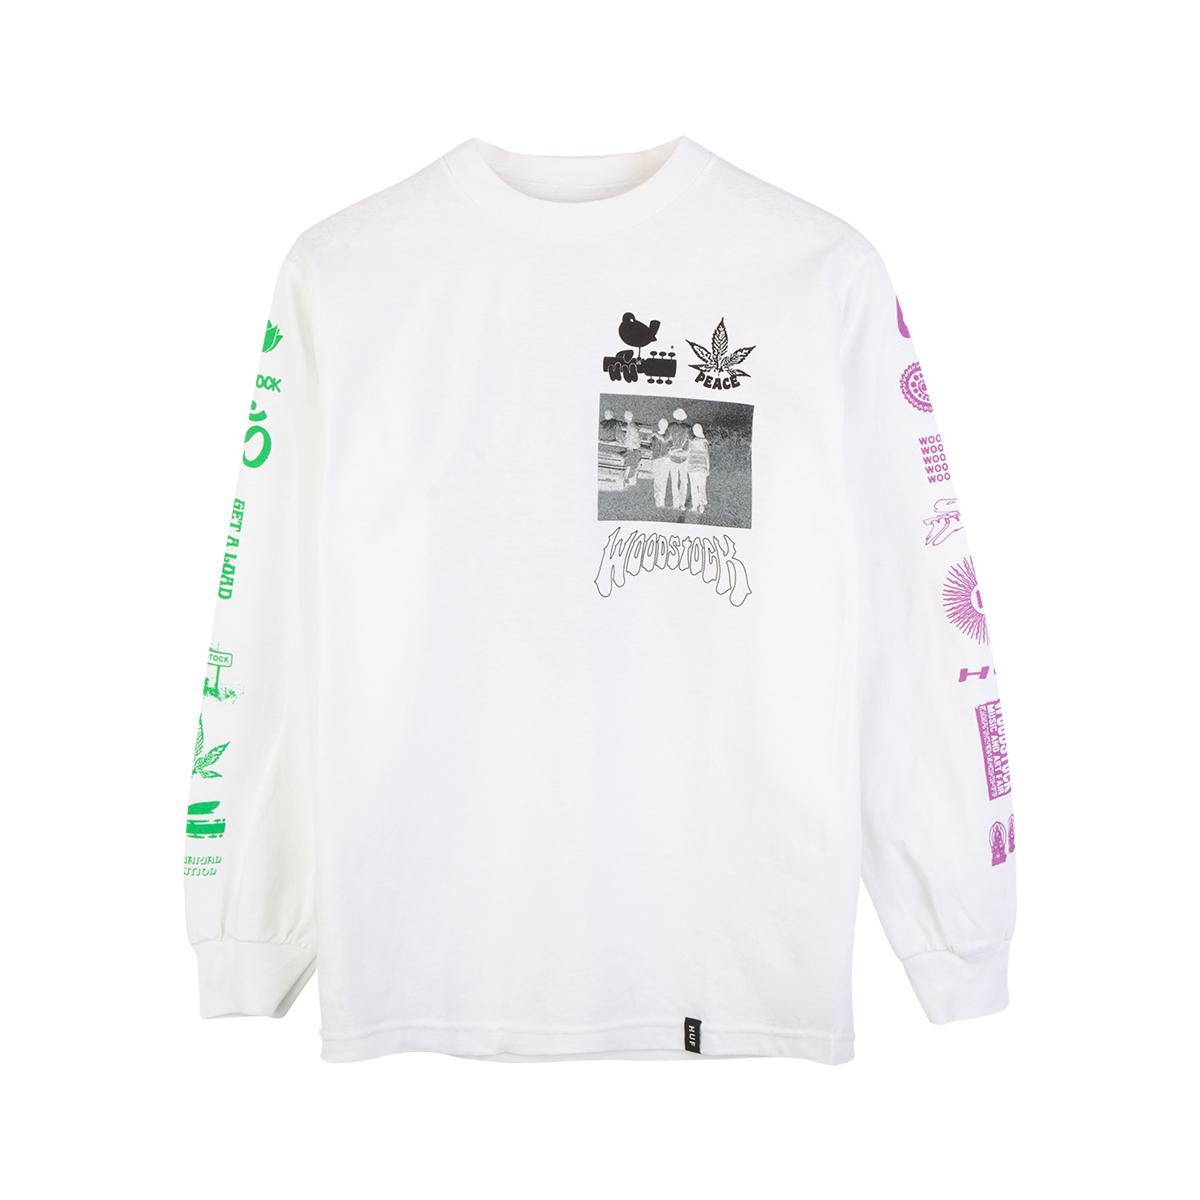 Woodstock x HUF Loaded LS T-shirt